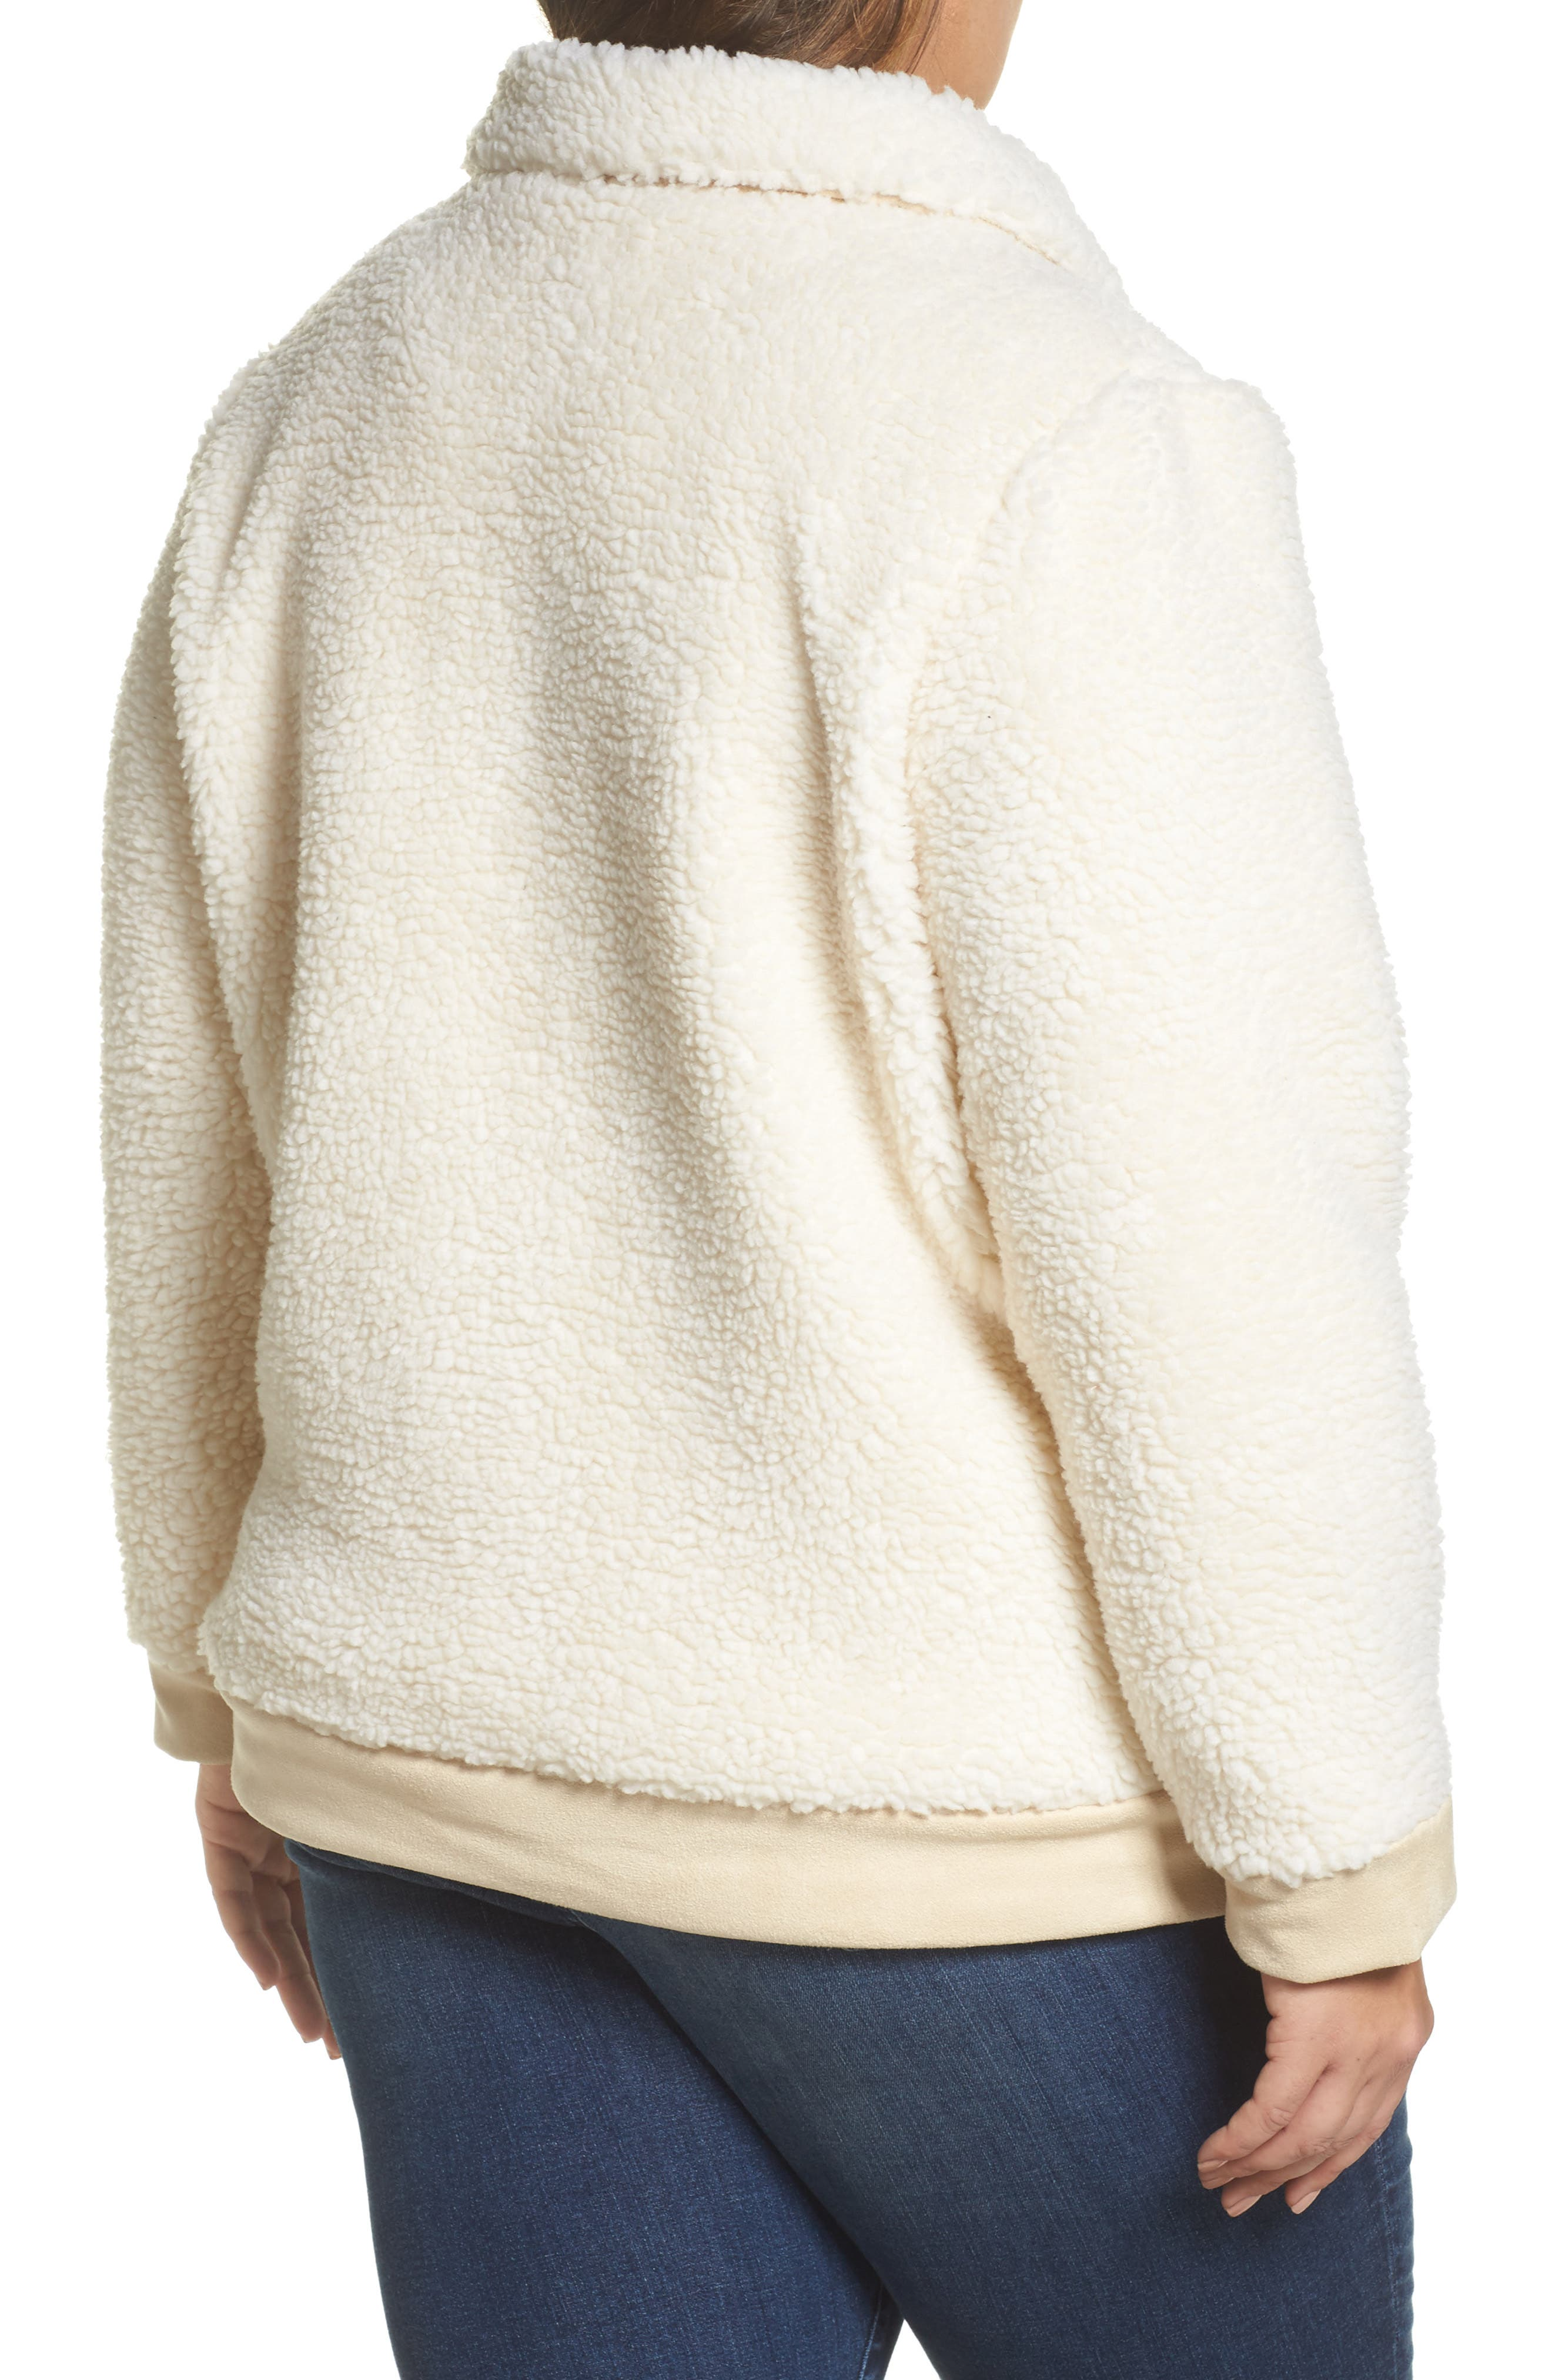 High Pile Fleece Jacket,                             Alternate thumbnail 2, color,                             Cream